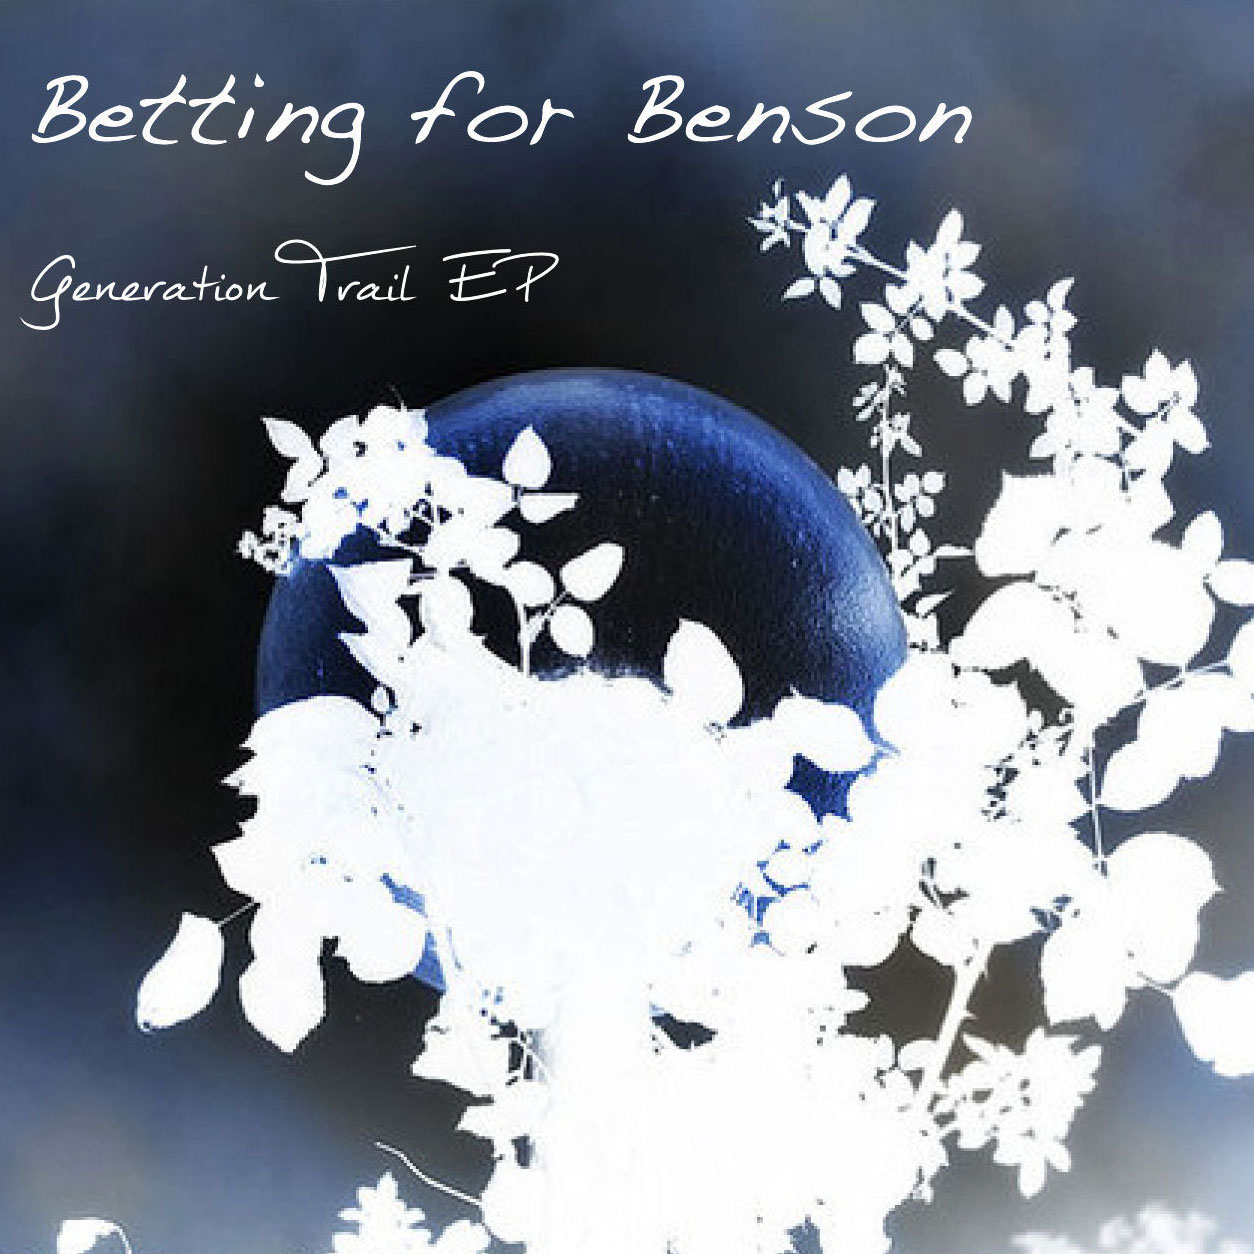 Generation Trail EP (2009)